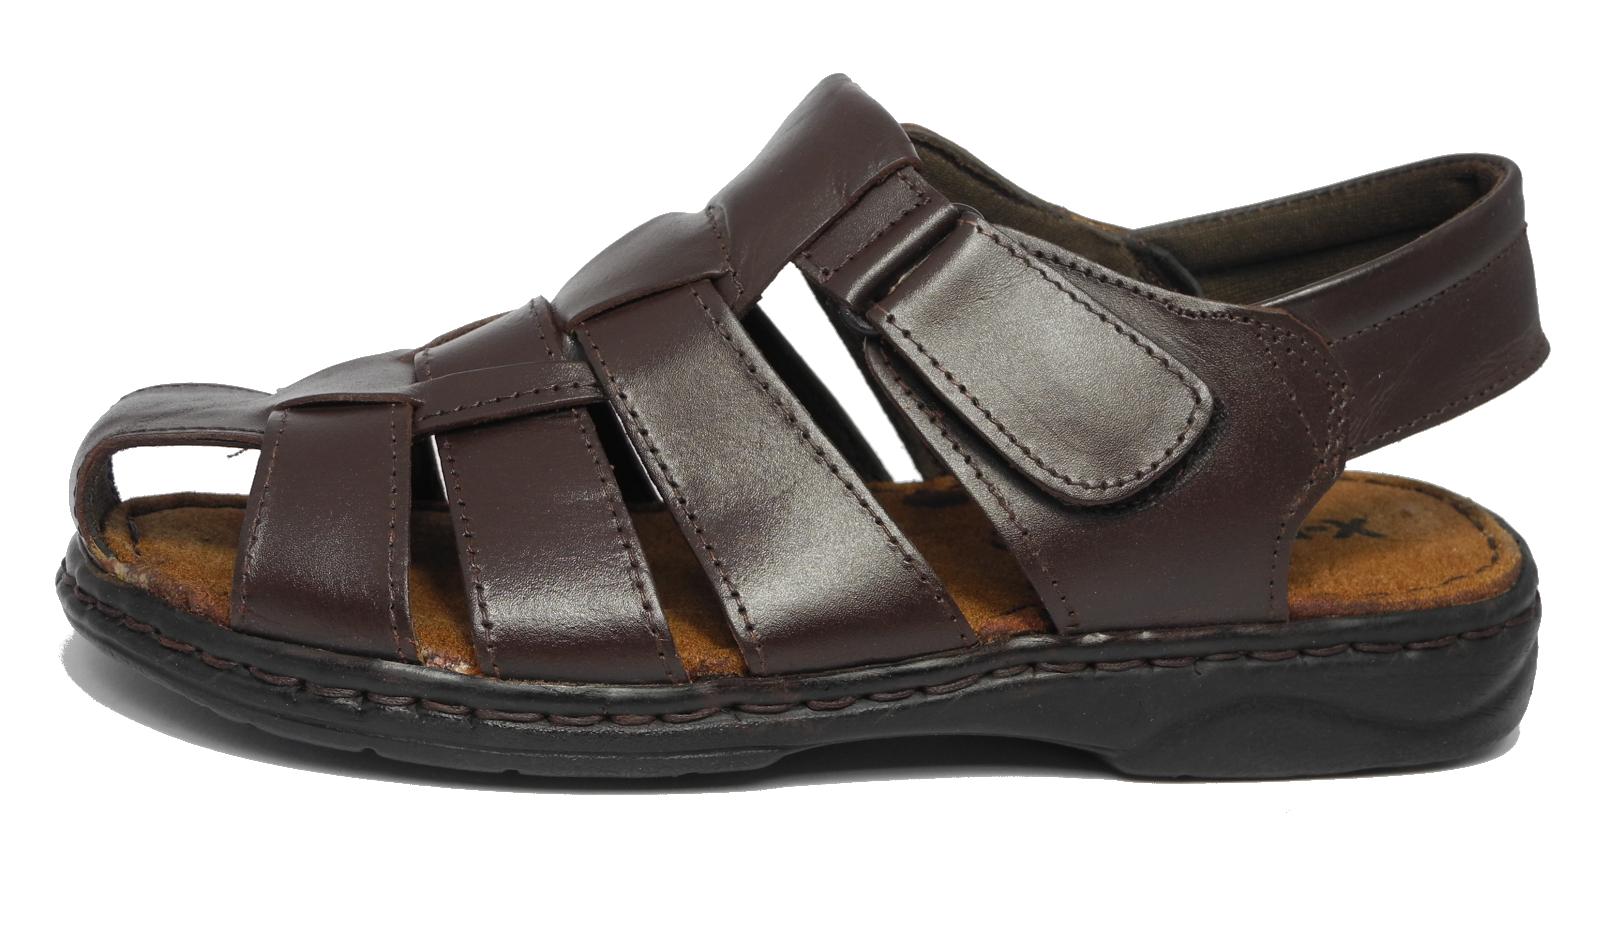 Black enclosed sandals - Mens Leather Closed